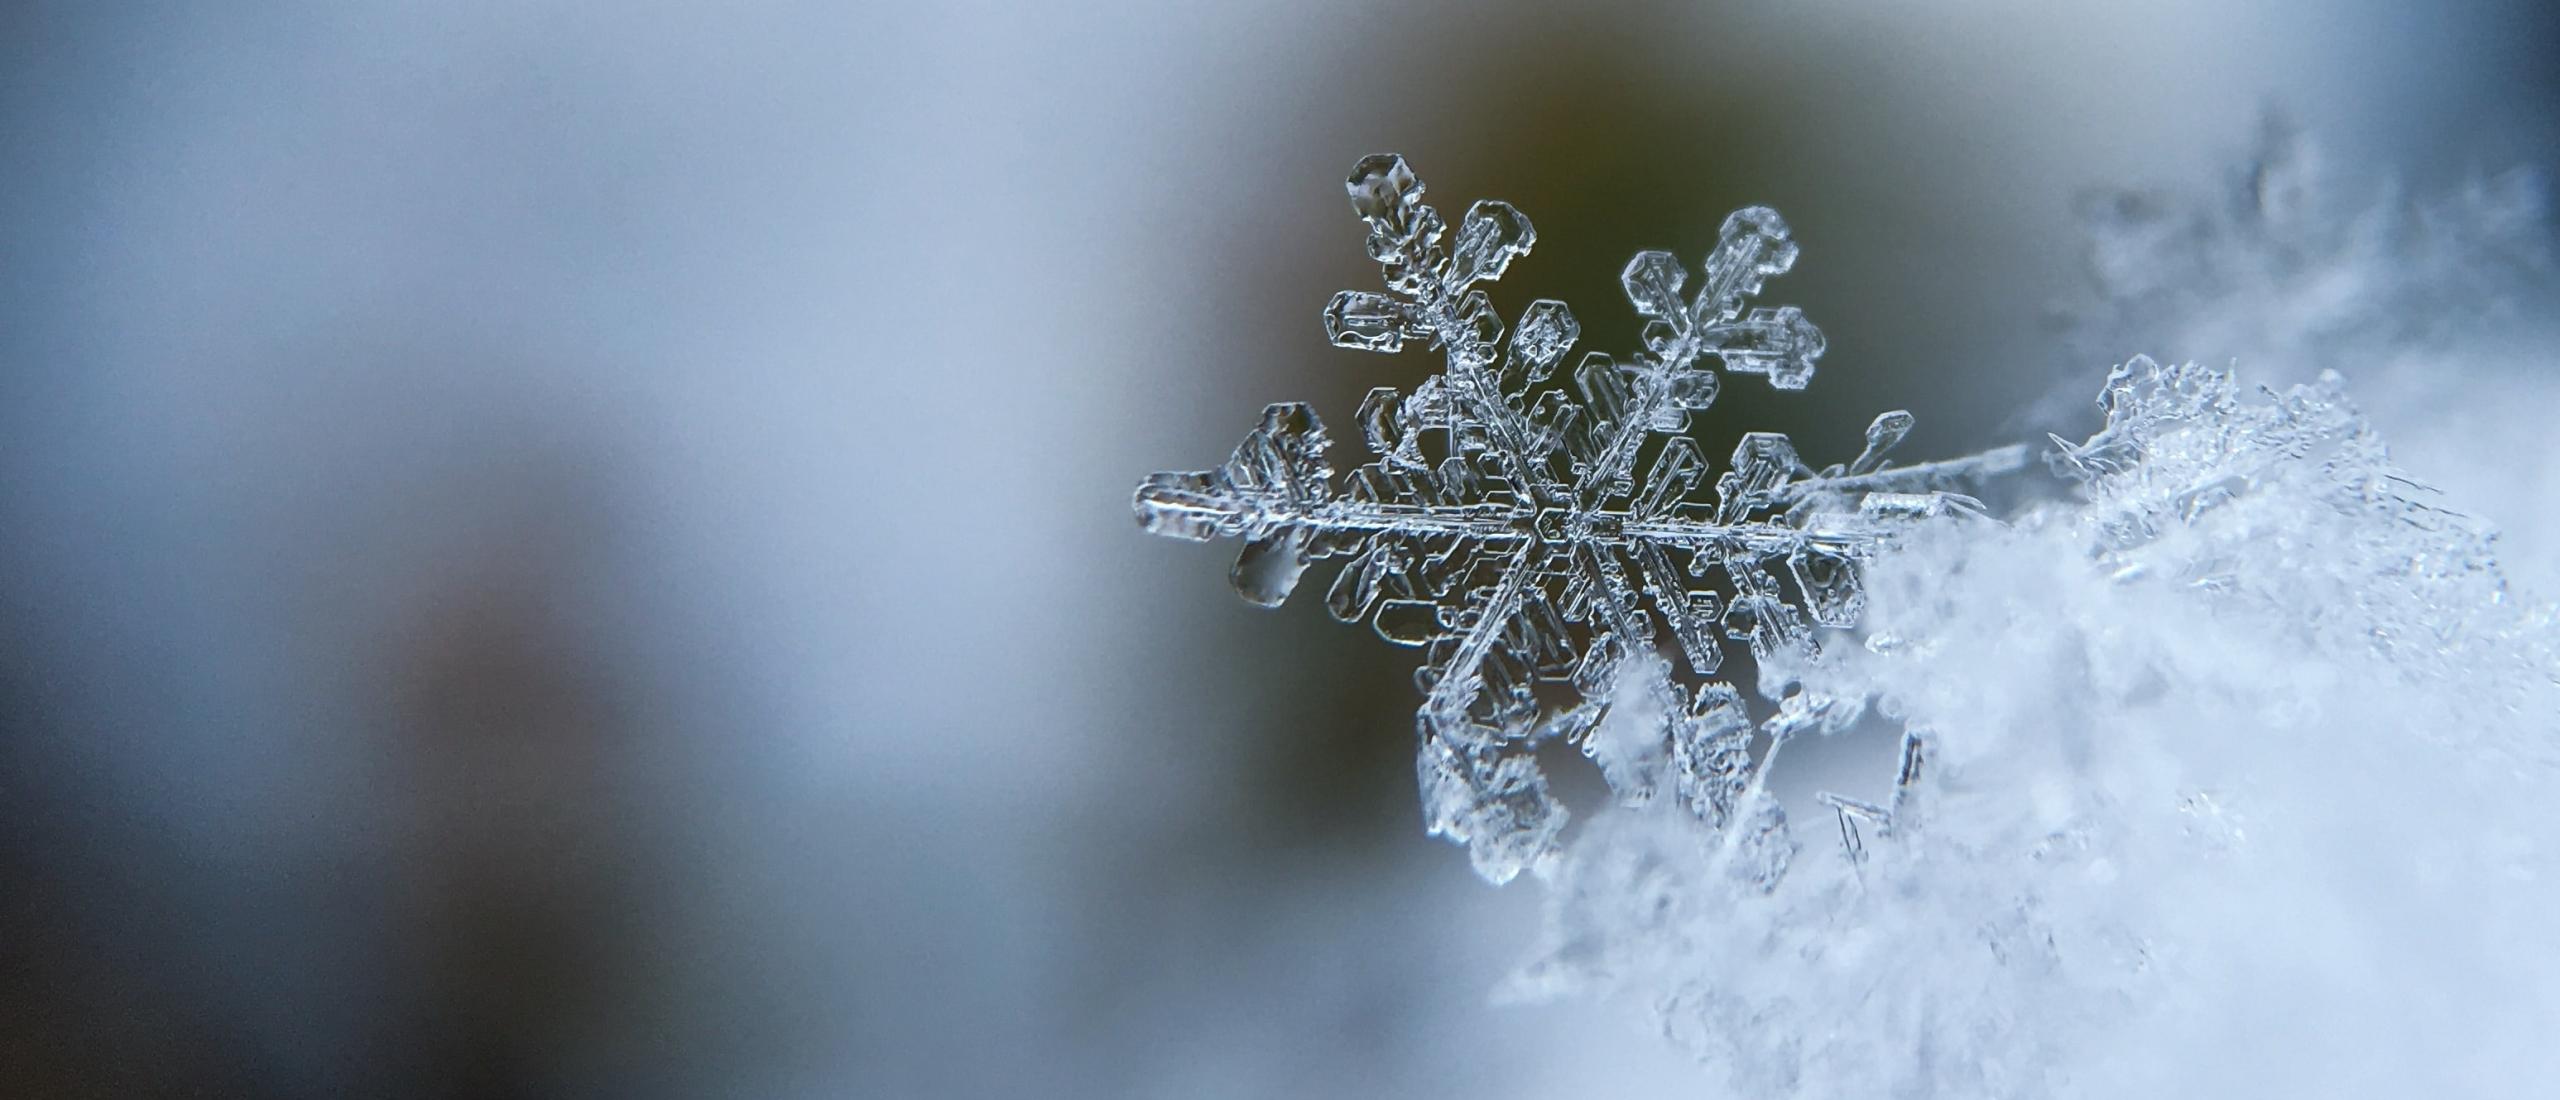 padel during winter